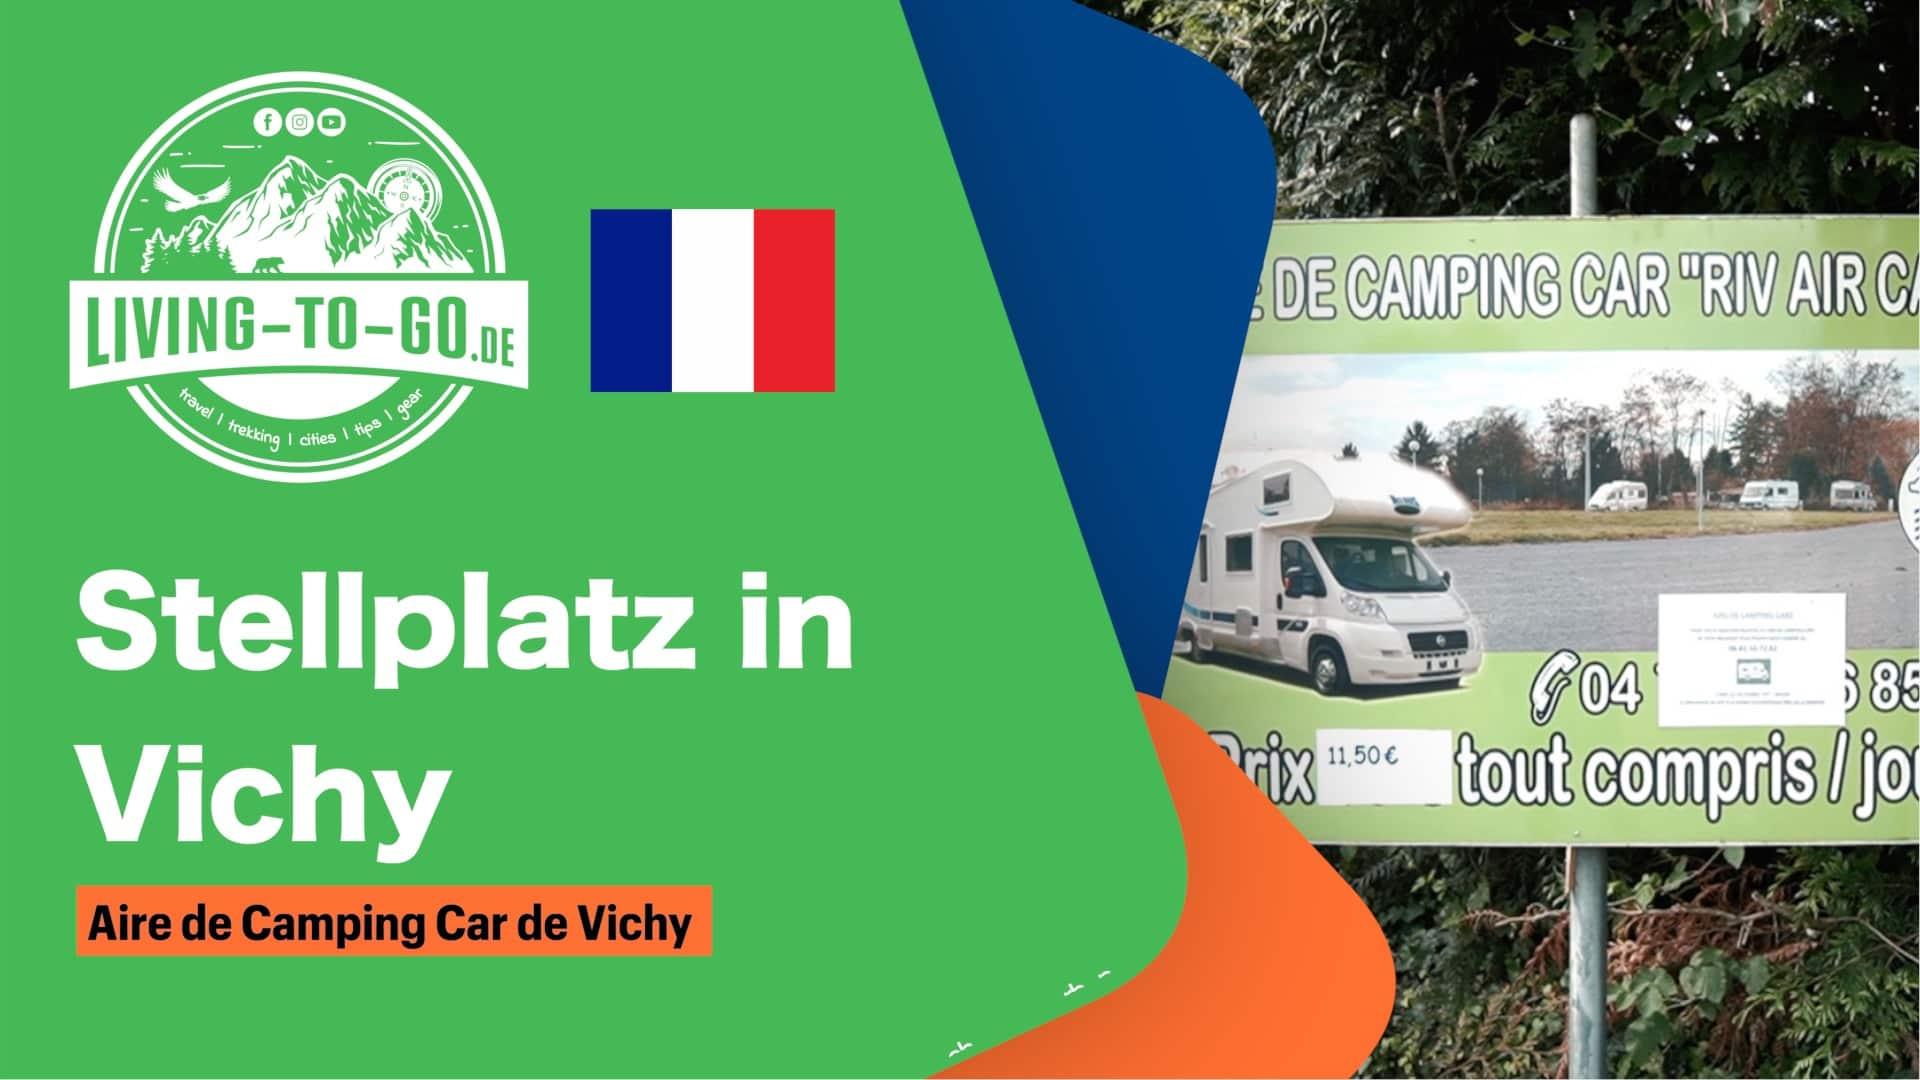 Aire de Camping Car de Vichy